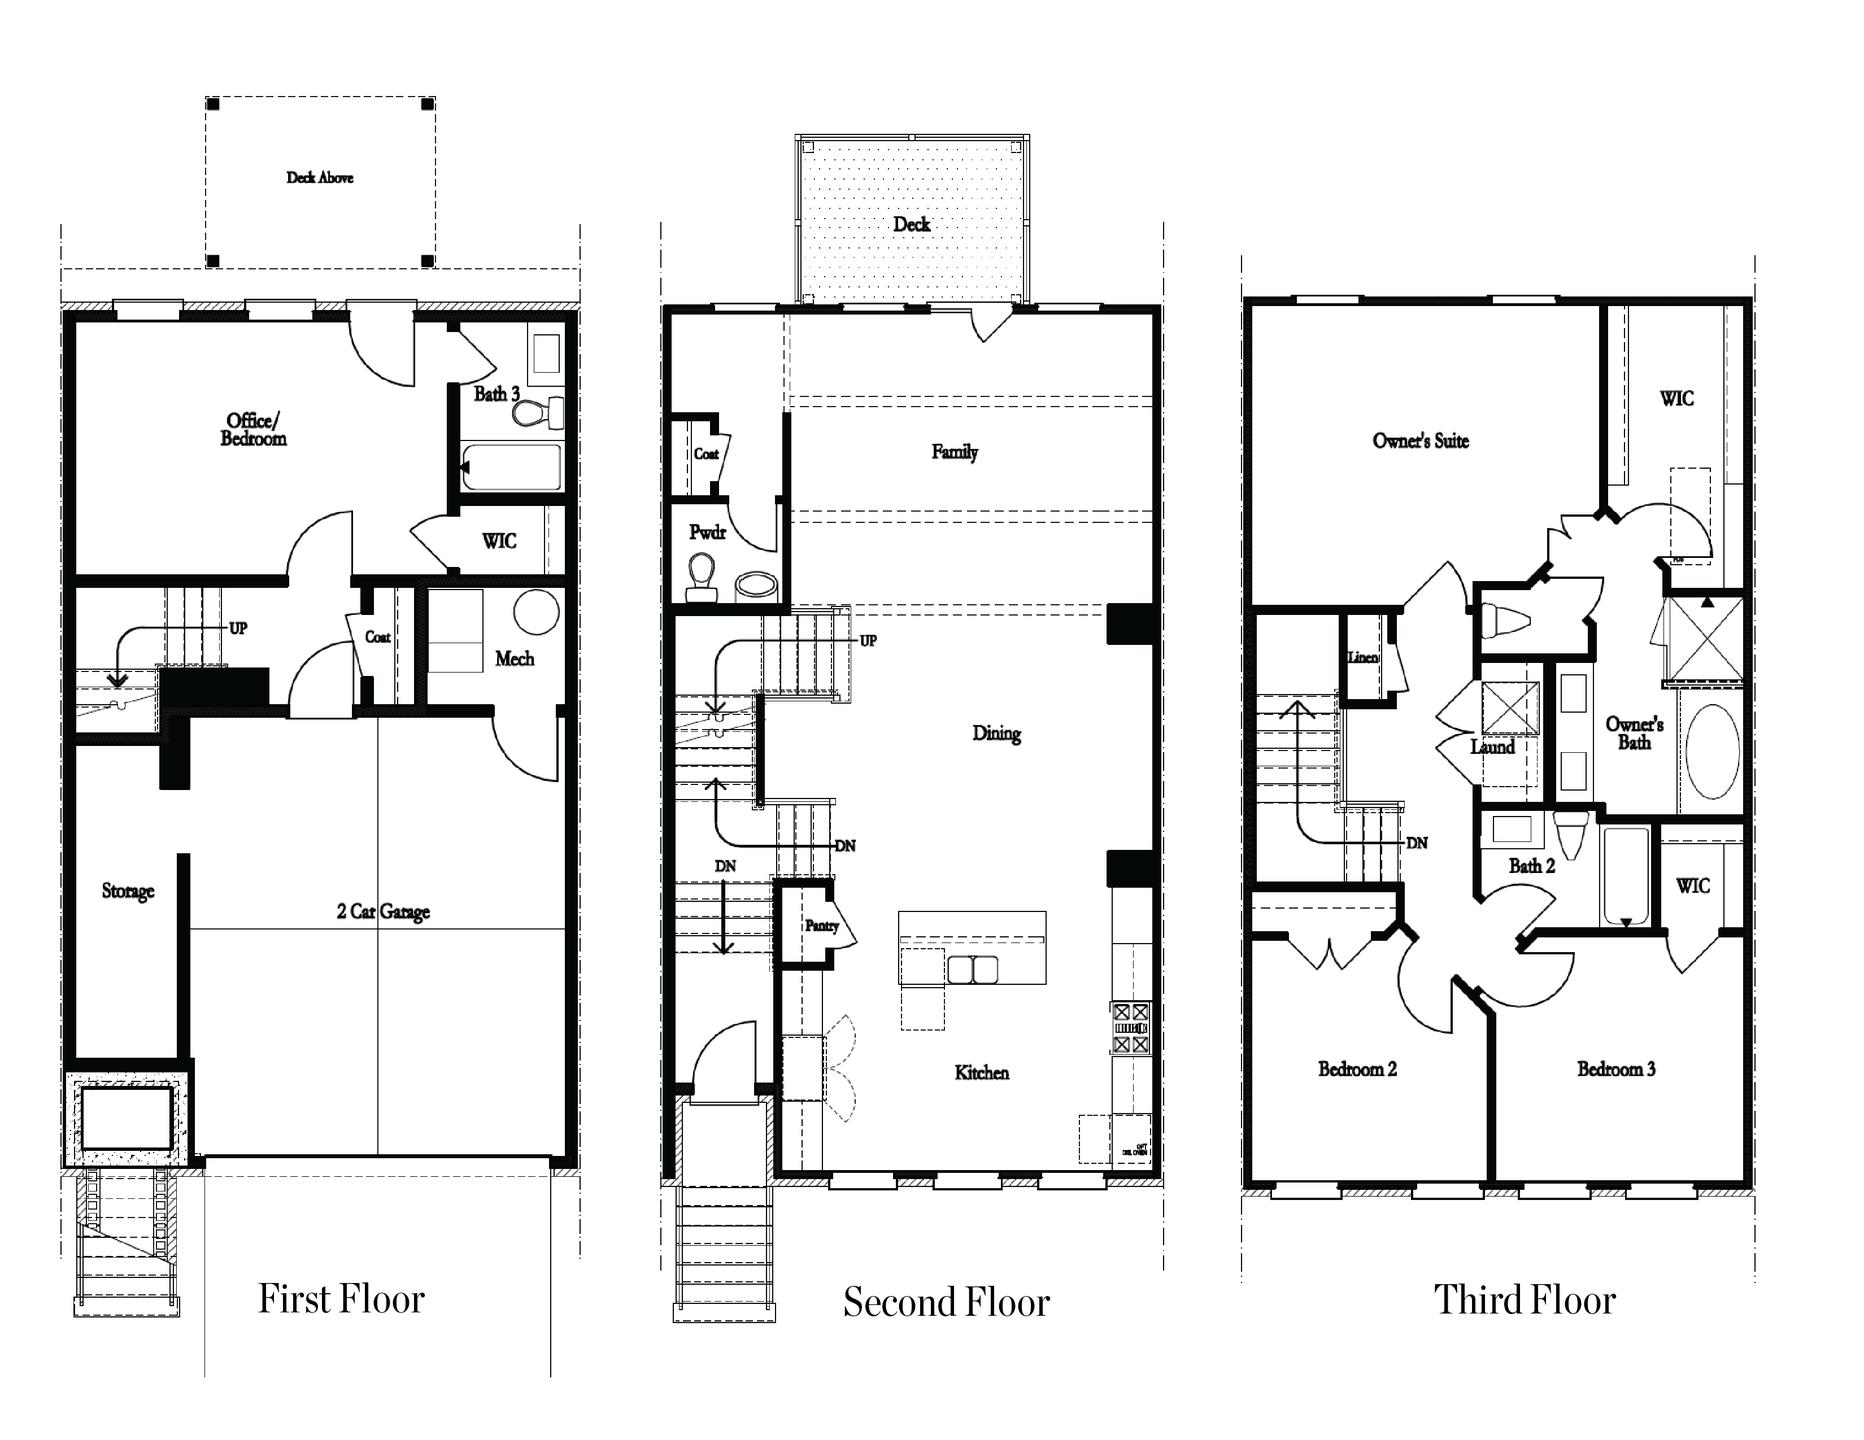 Floor Plans. New Home in Smyrna, GA